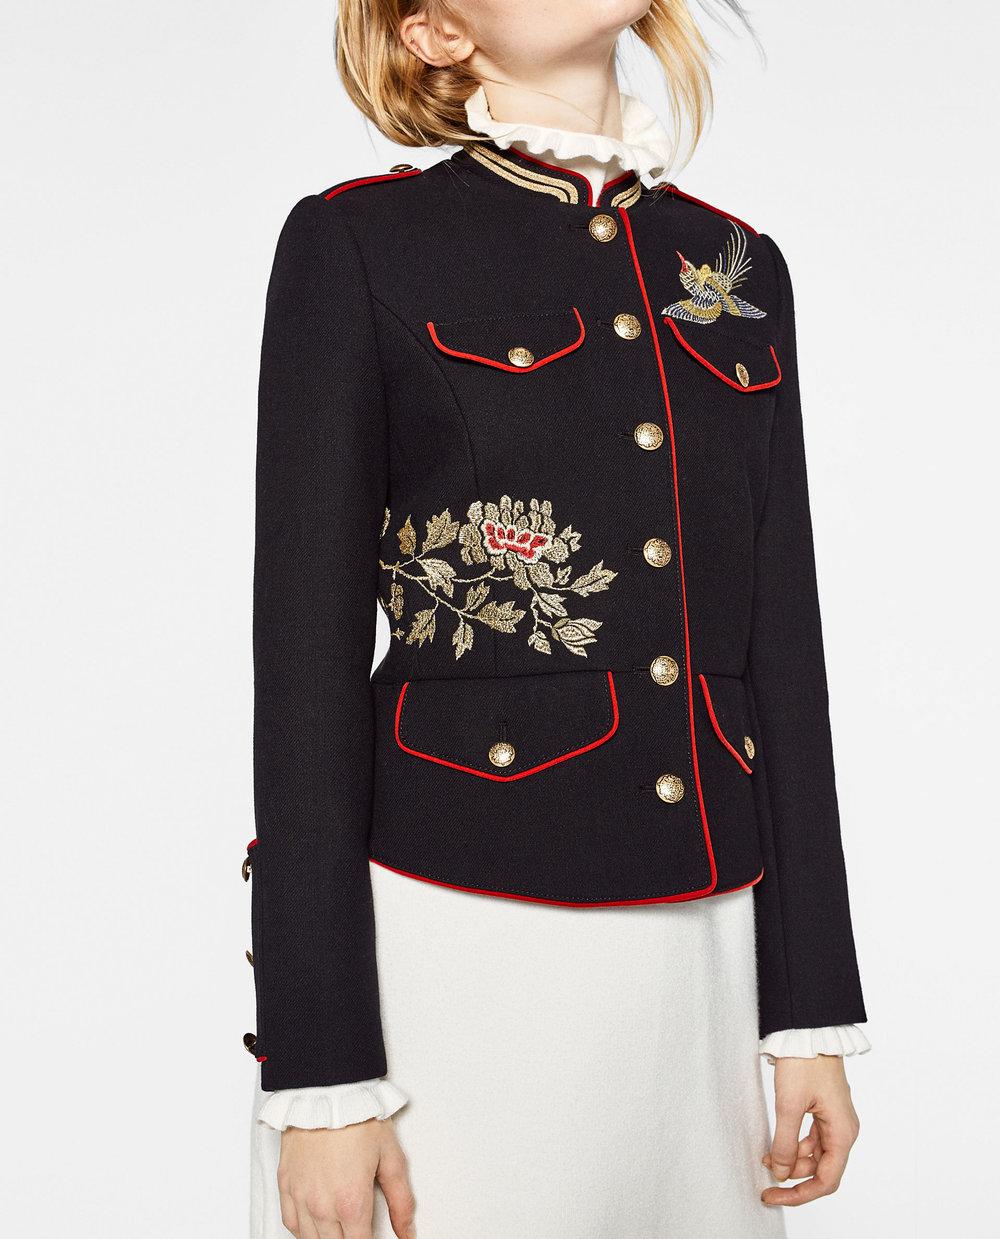 Zara - Embroidered Jacket